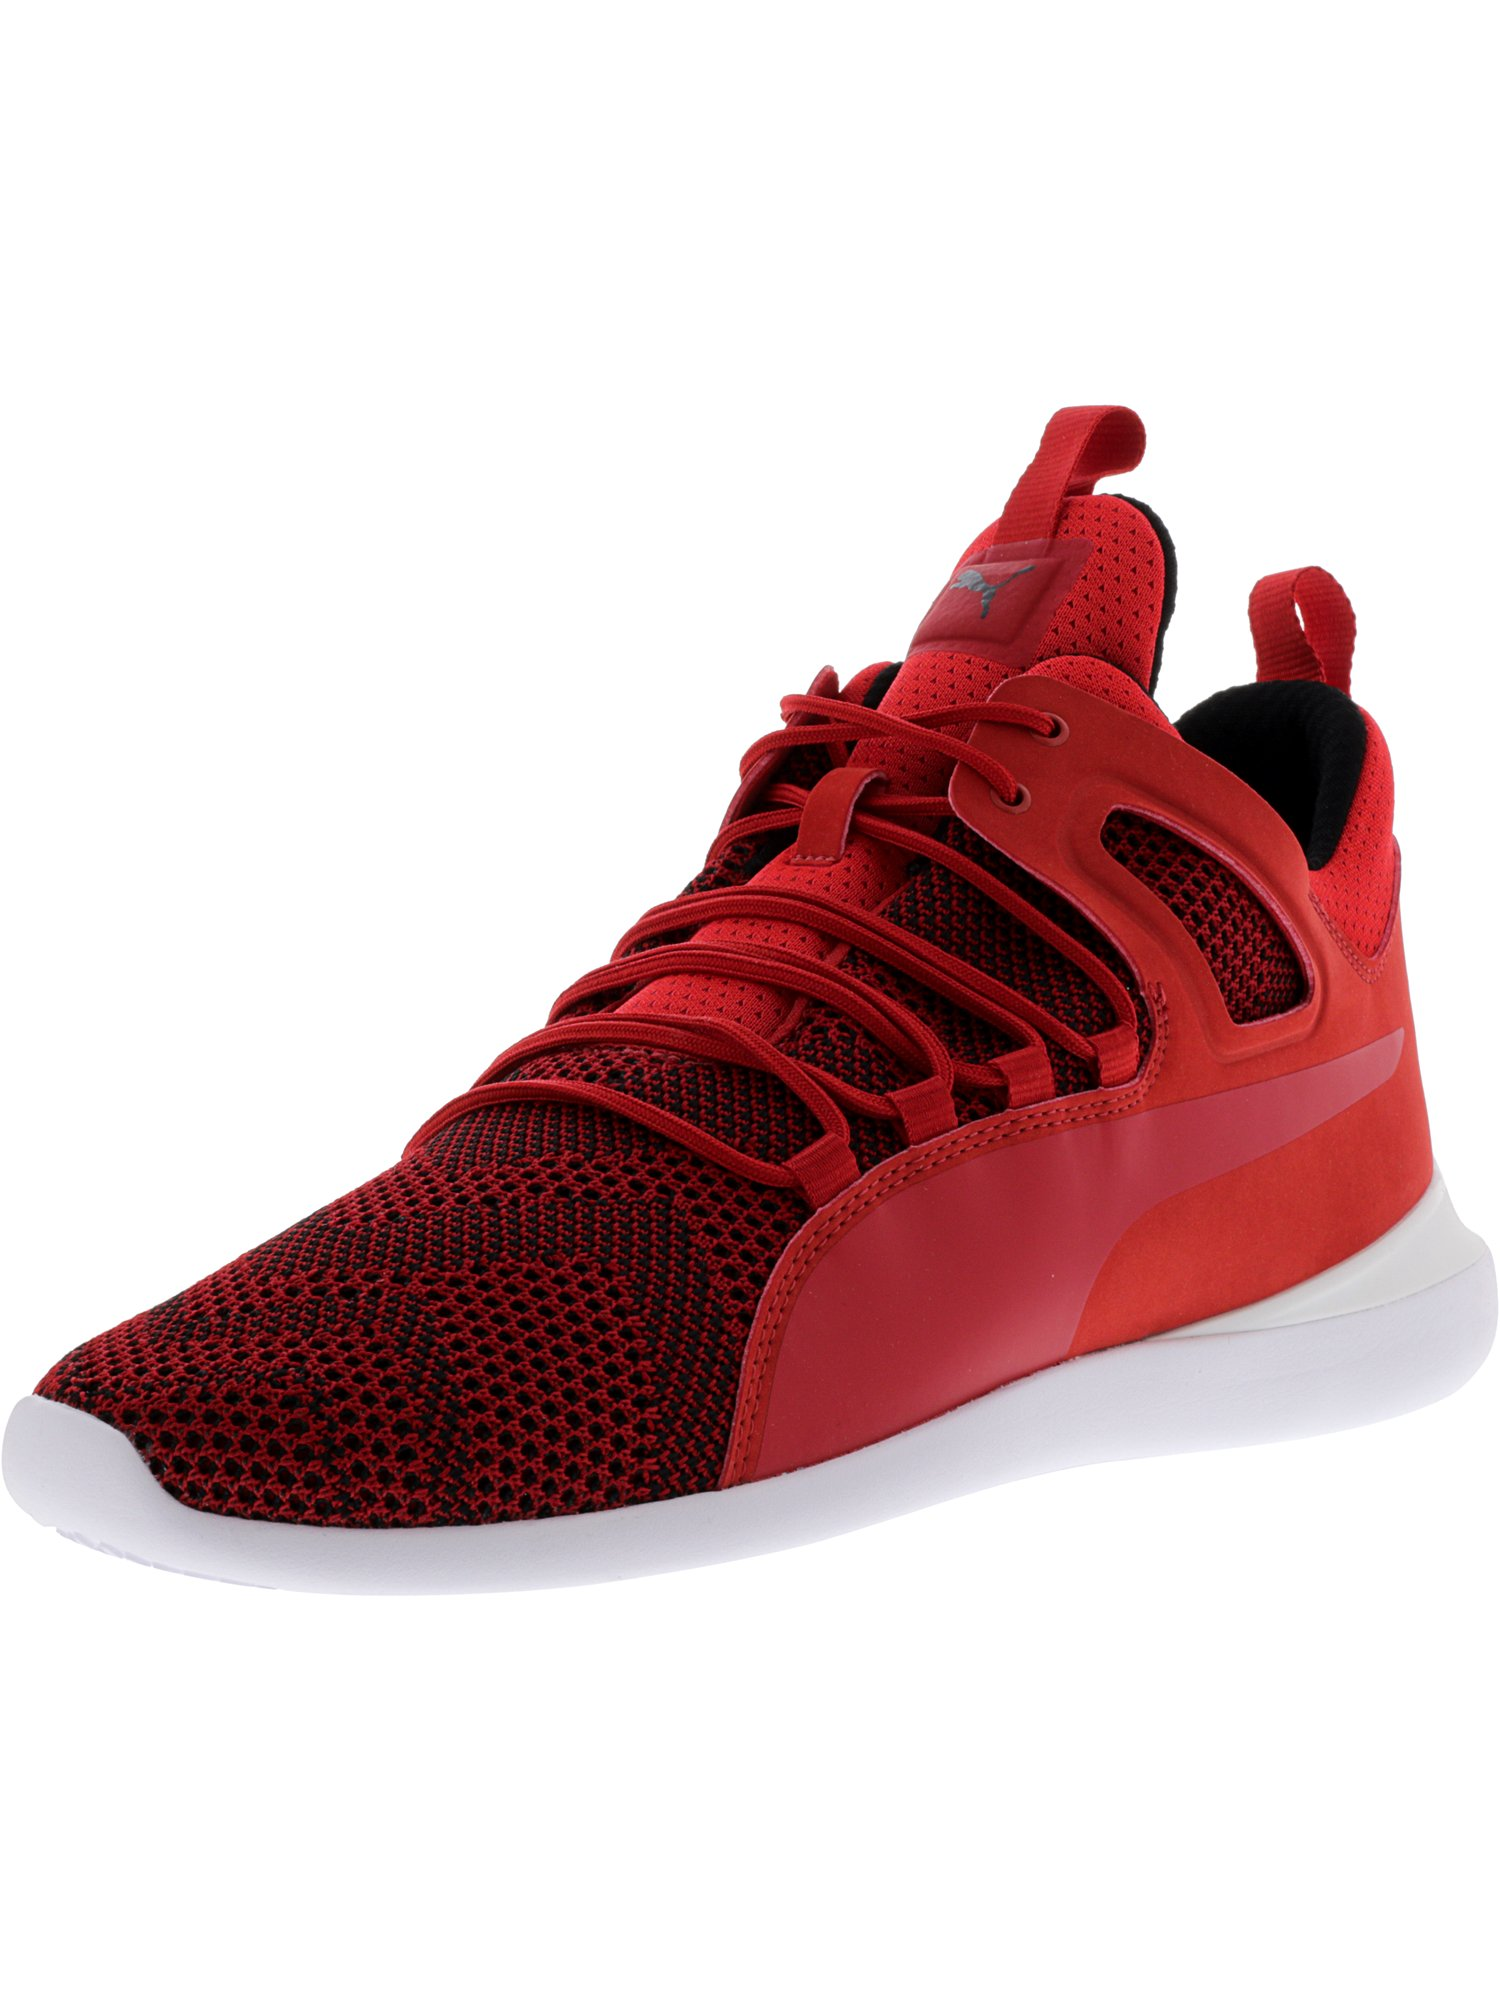 ... get puma mens ferrari evo cat mid rosso corsa white ankle high fashion  sneaker 11m 6151d france ... dfbbbe7c8